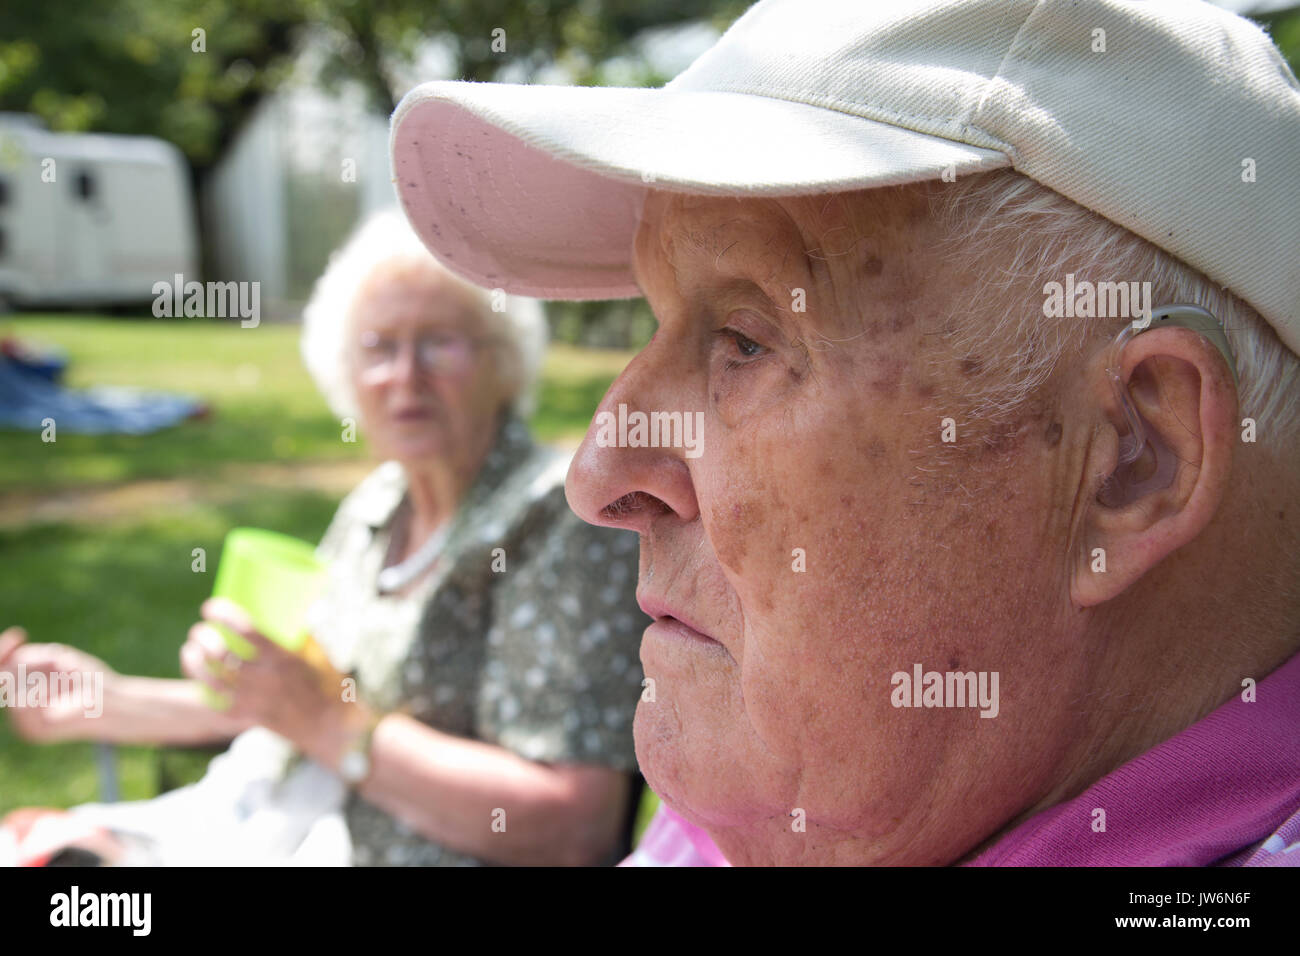 Elderly man wearing hearing aid, outdoors, England, UK - Stock Image